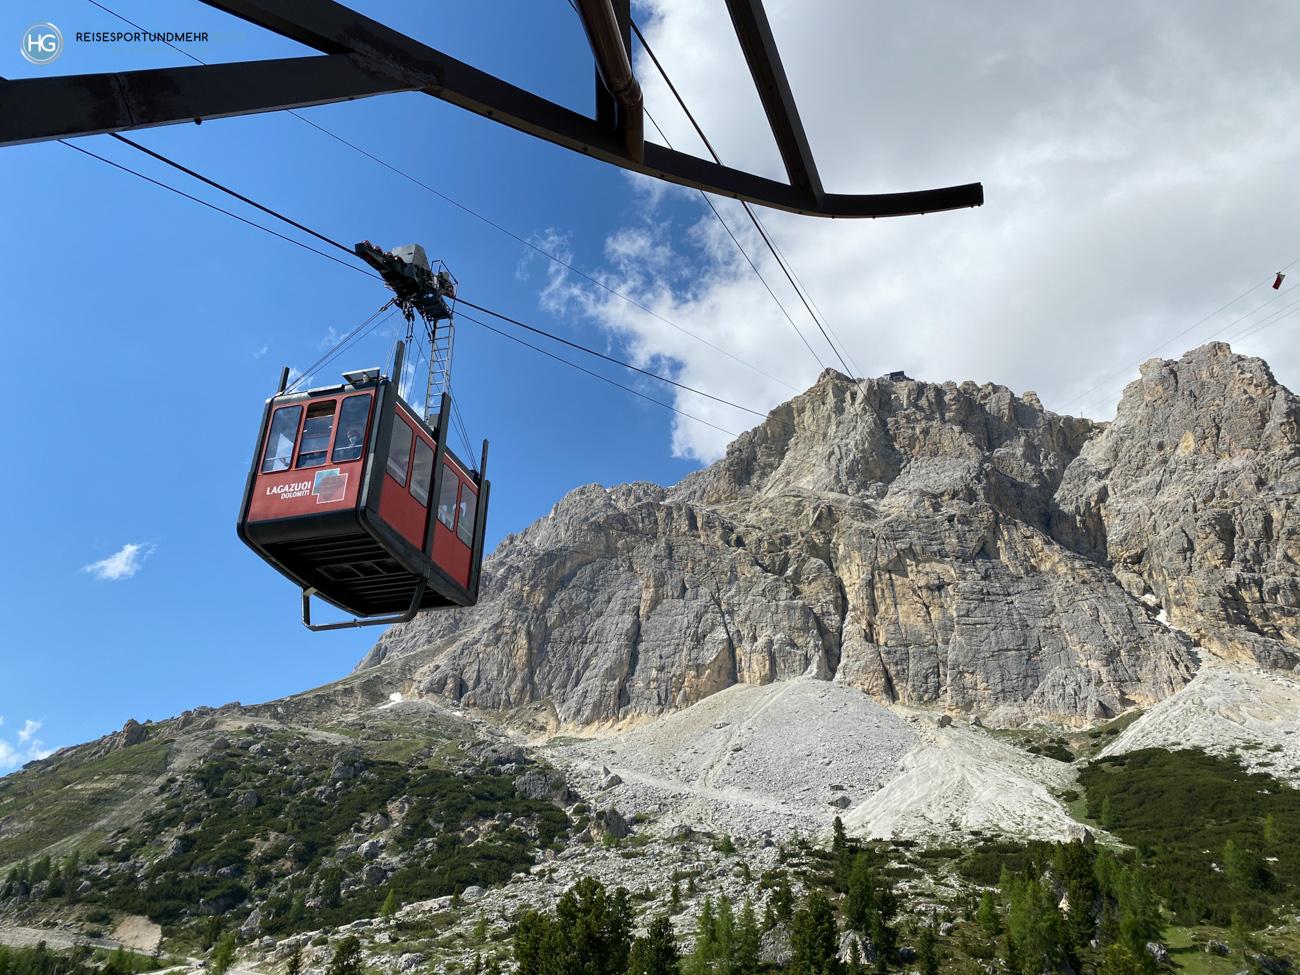 Südtirol im Juni Lagazuoi Falzarego (Foto: Hanns Gröner)